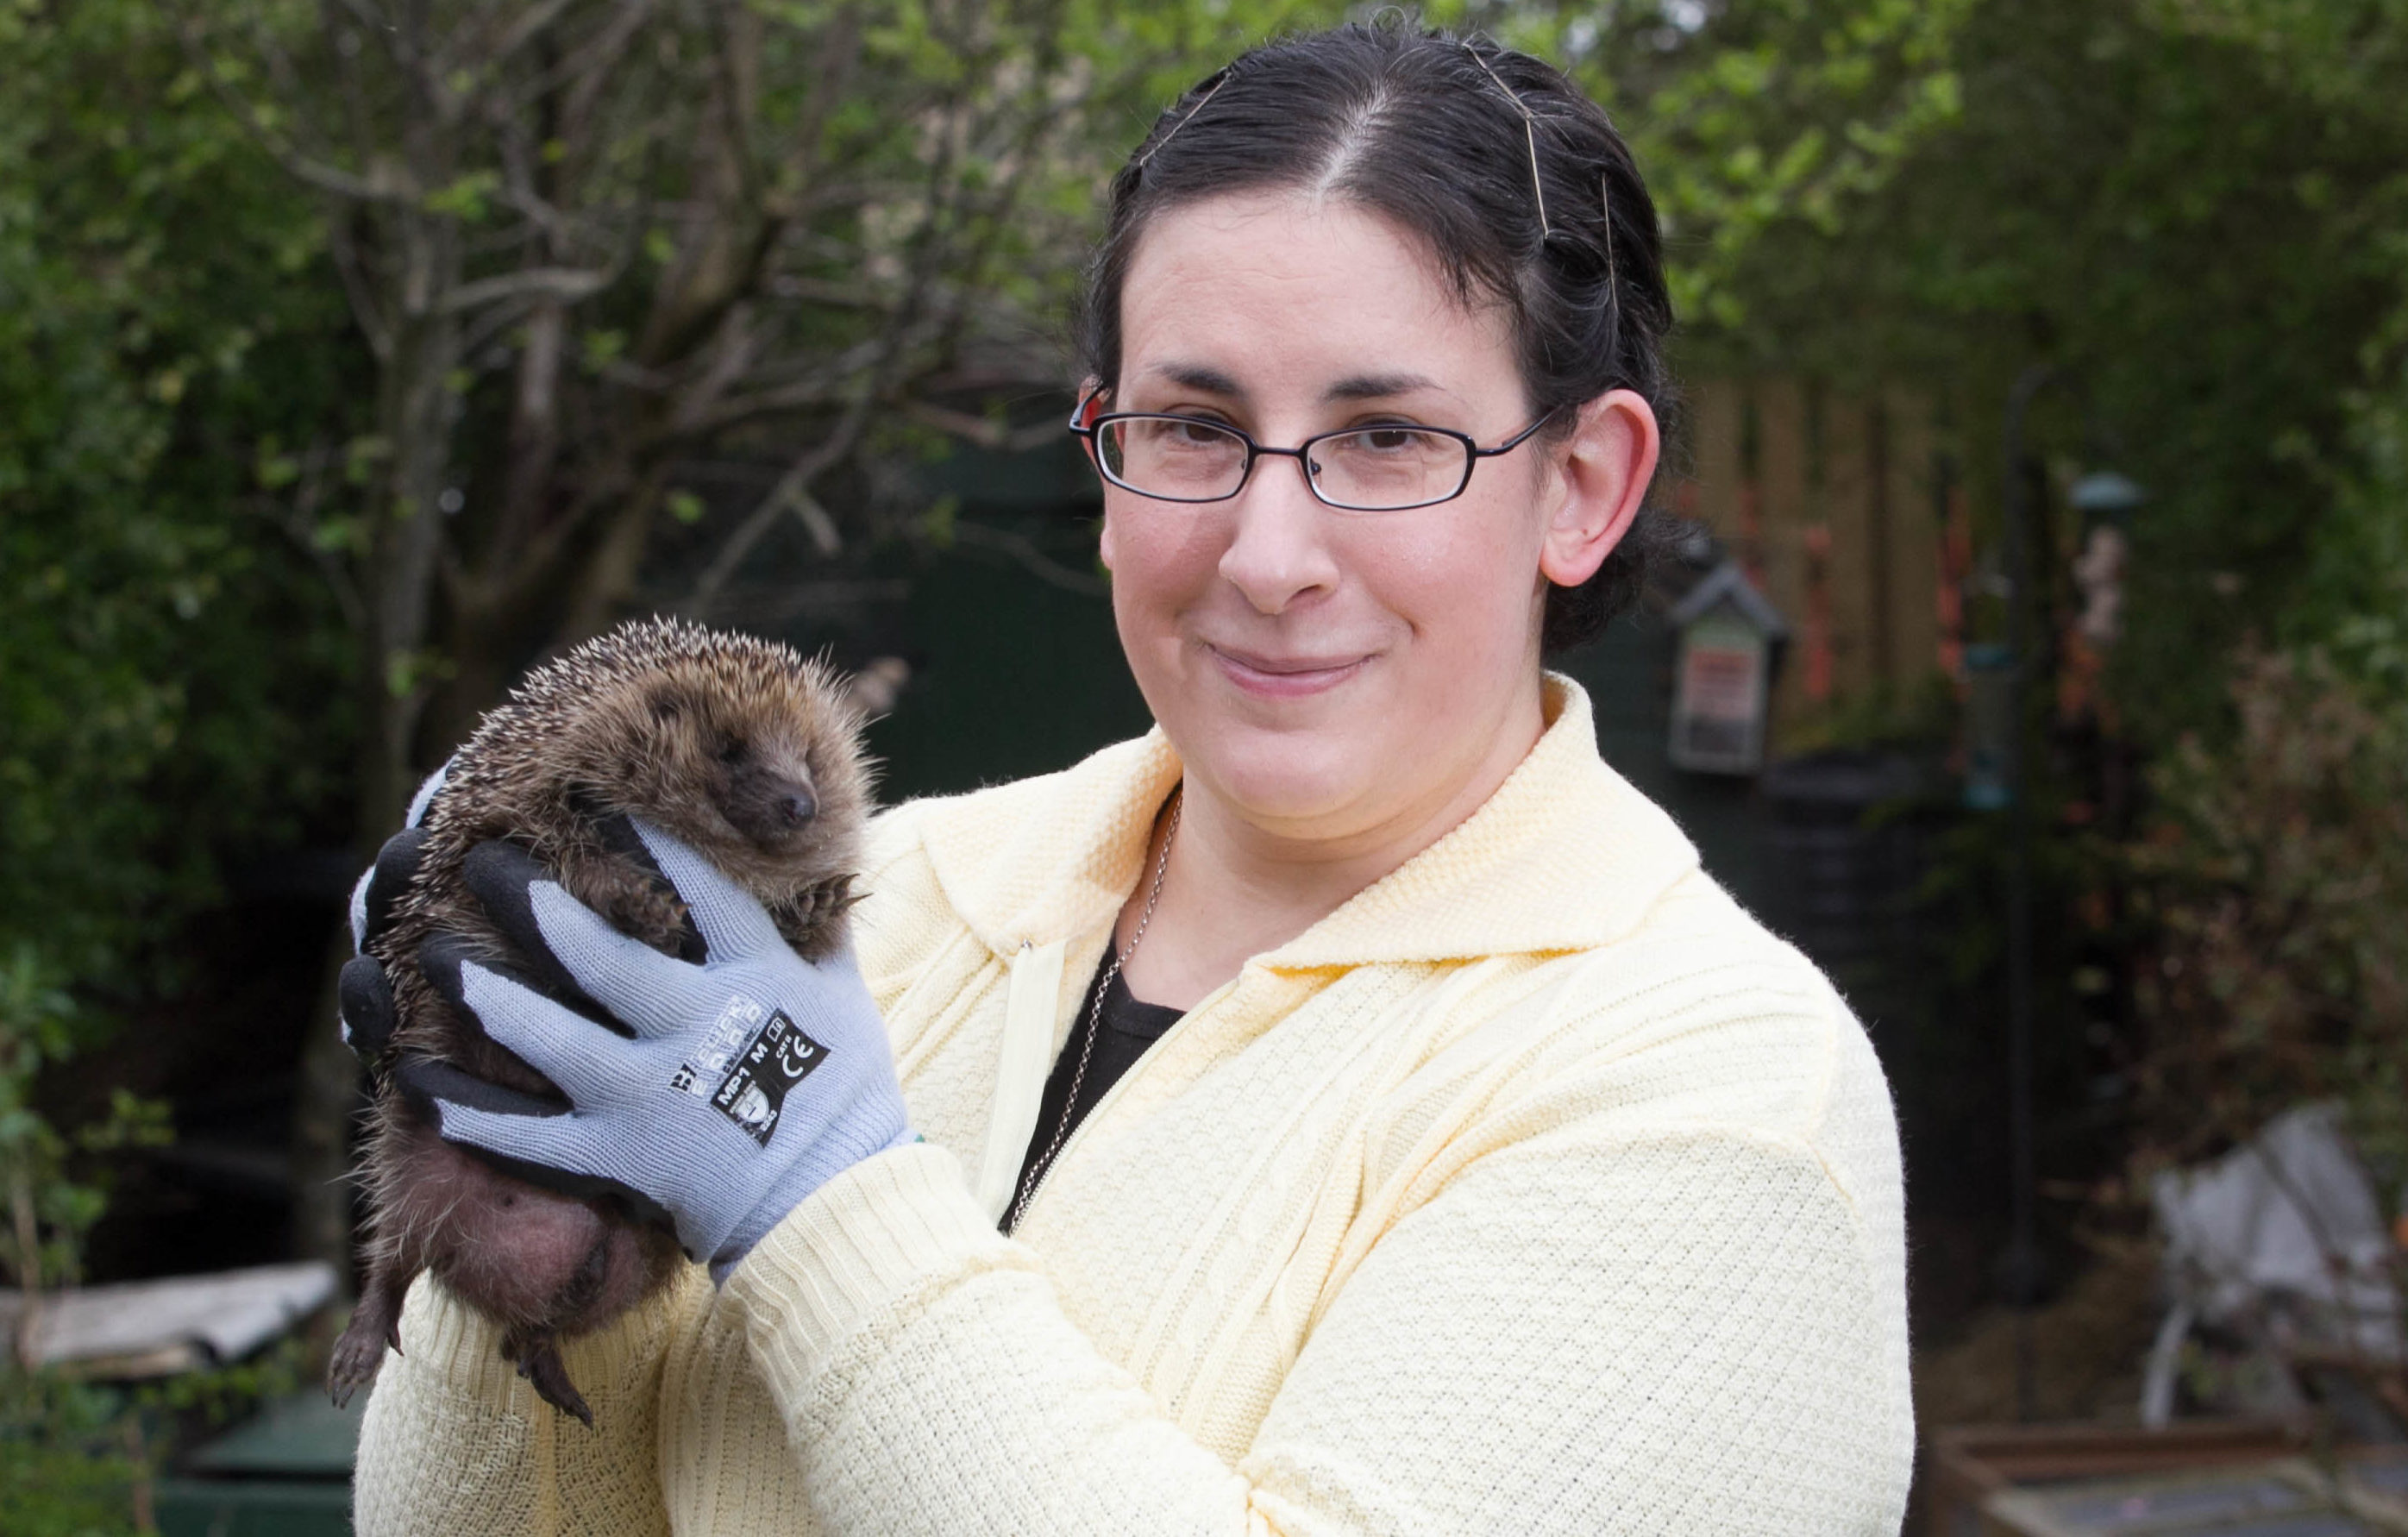 Nadia Al-Dujaii runs Forth Hedgehog Hospital from her home in Roysth (Chris Austin / DC Thomson)